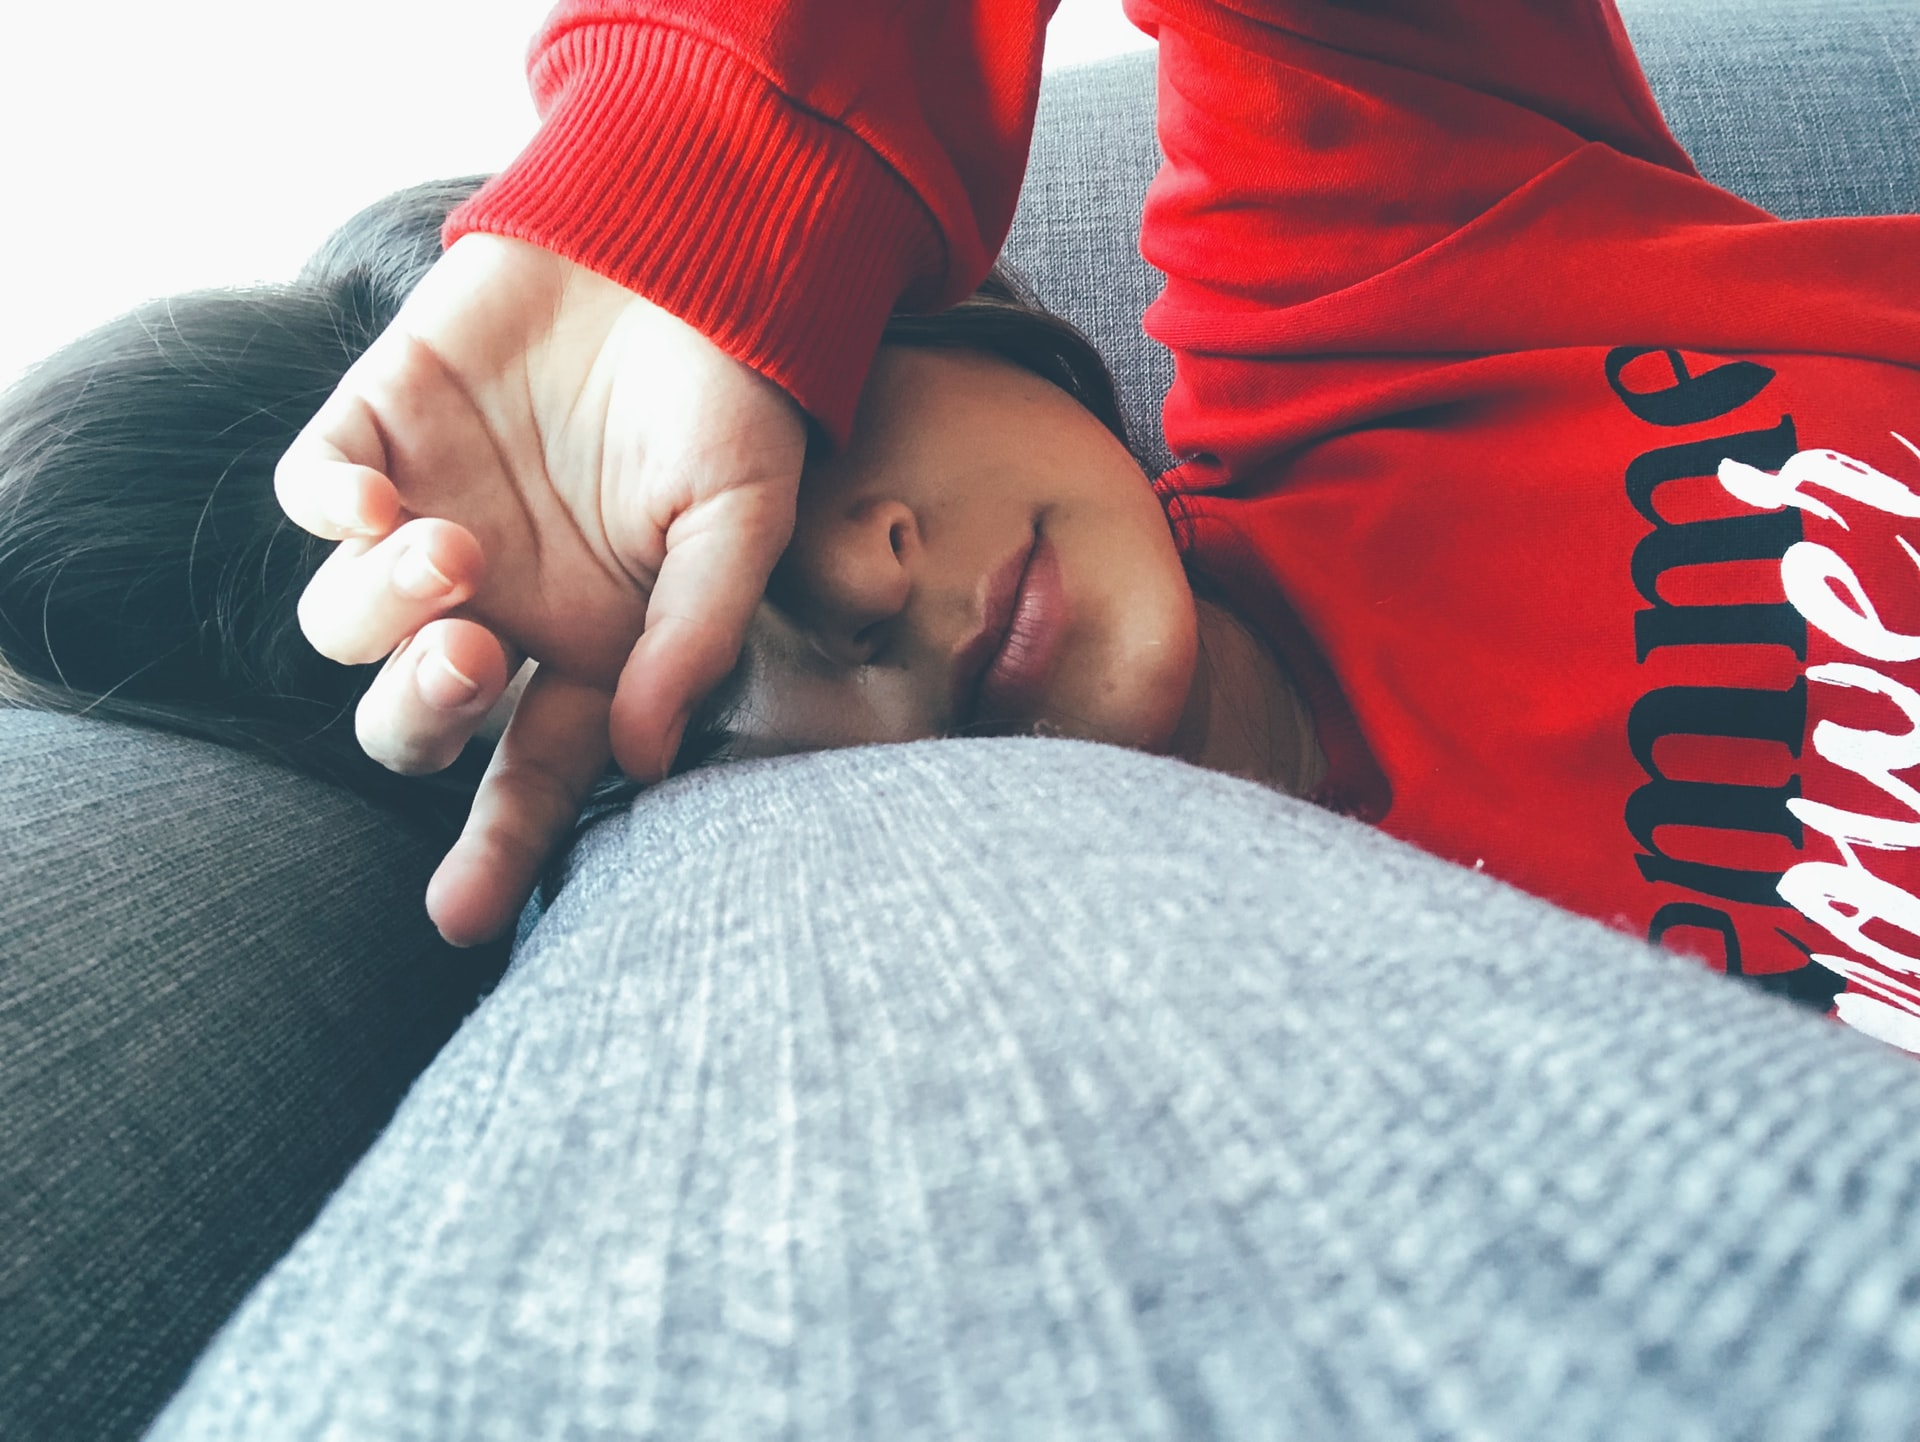 Chronique fatigue from Covid-19